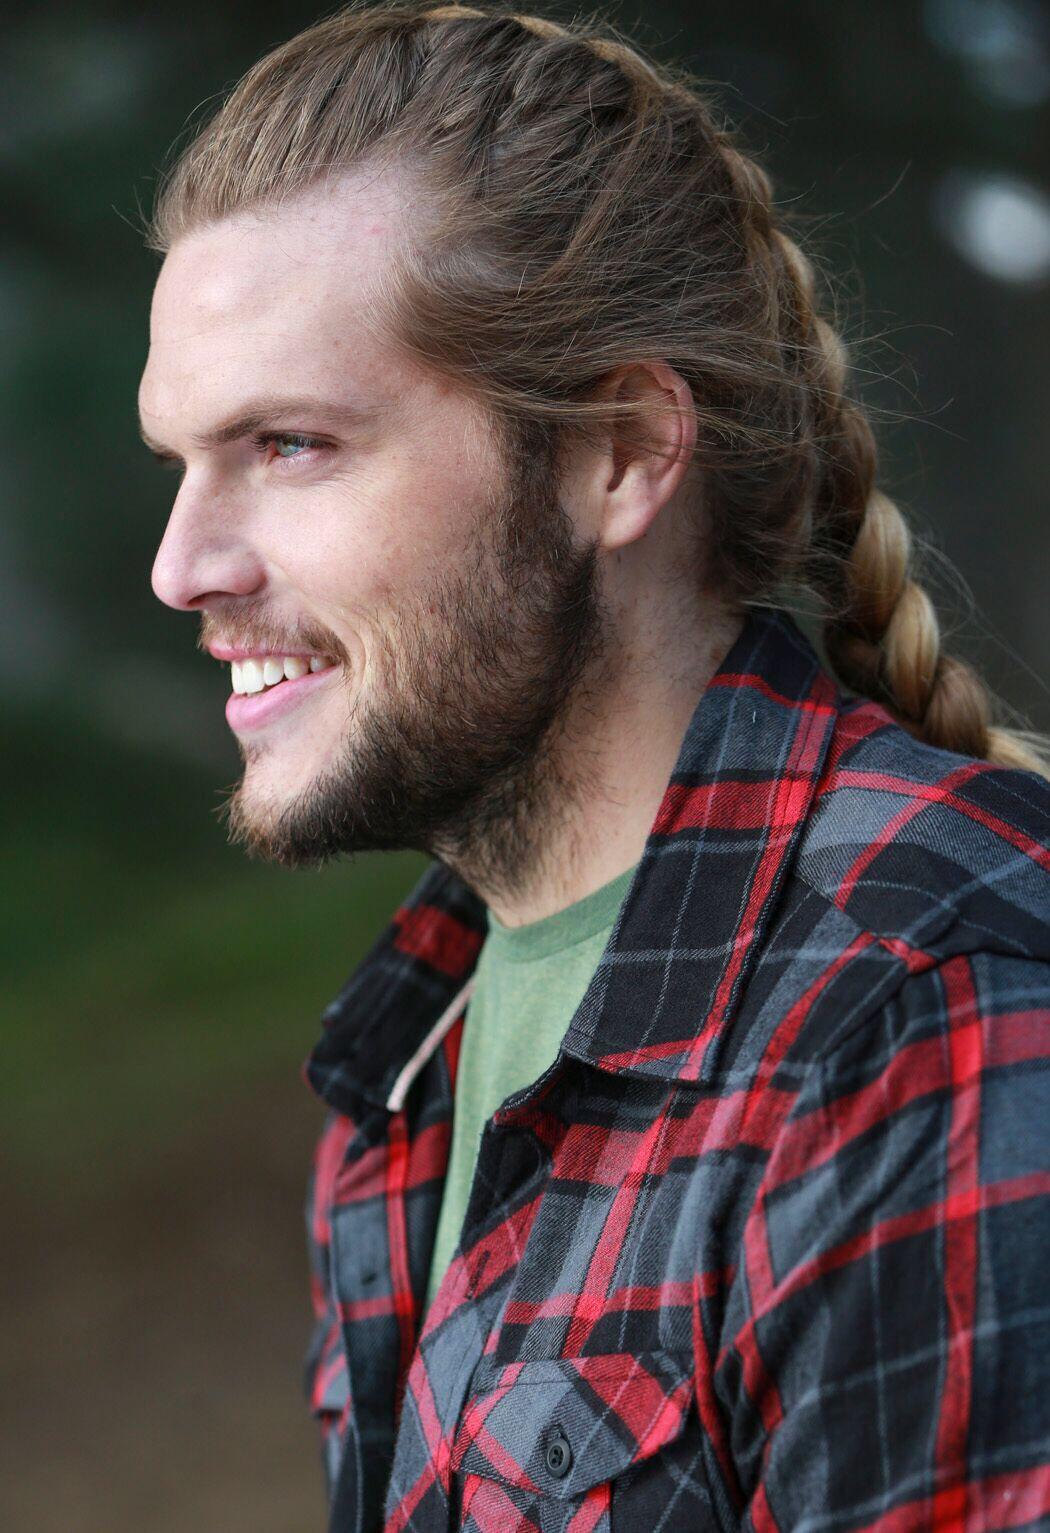 Superb Doing Lumberjack Things Travisonic And Ladyolympia Making This Natural Hairstyles Runnerswayorg